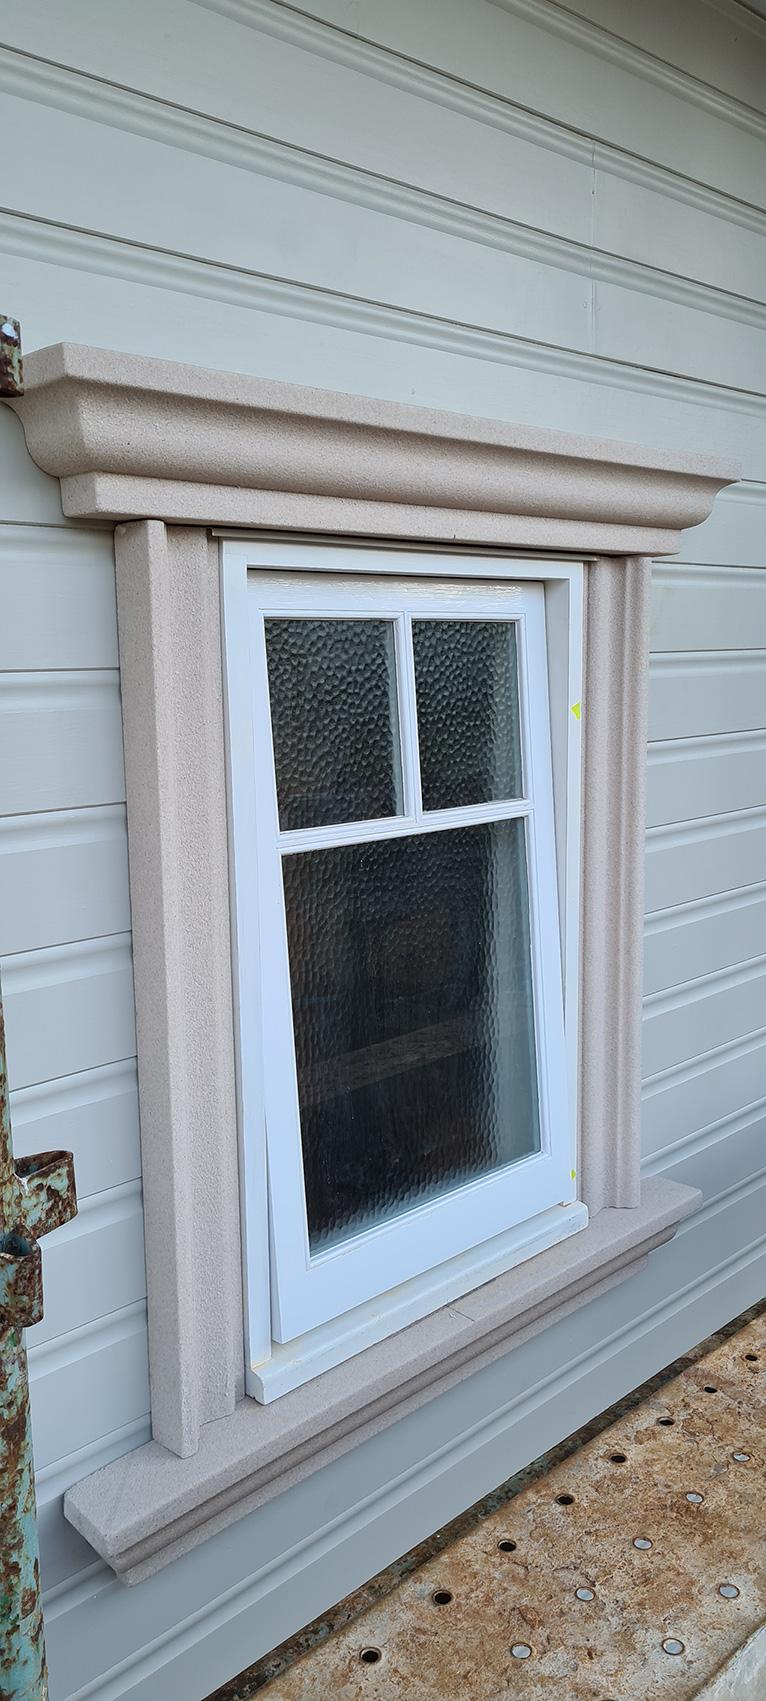 decorative period external window sil and surrounds Gold Coast Australia